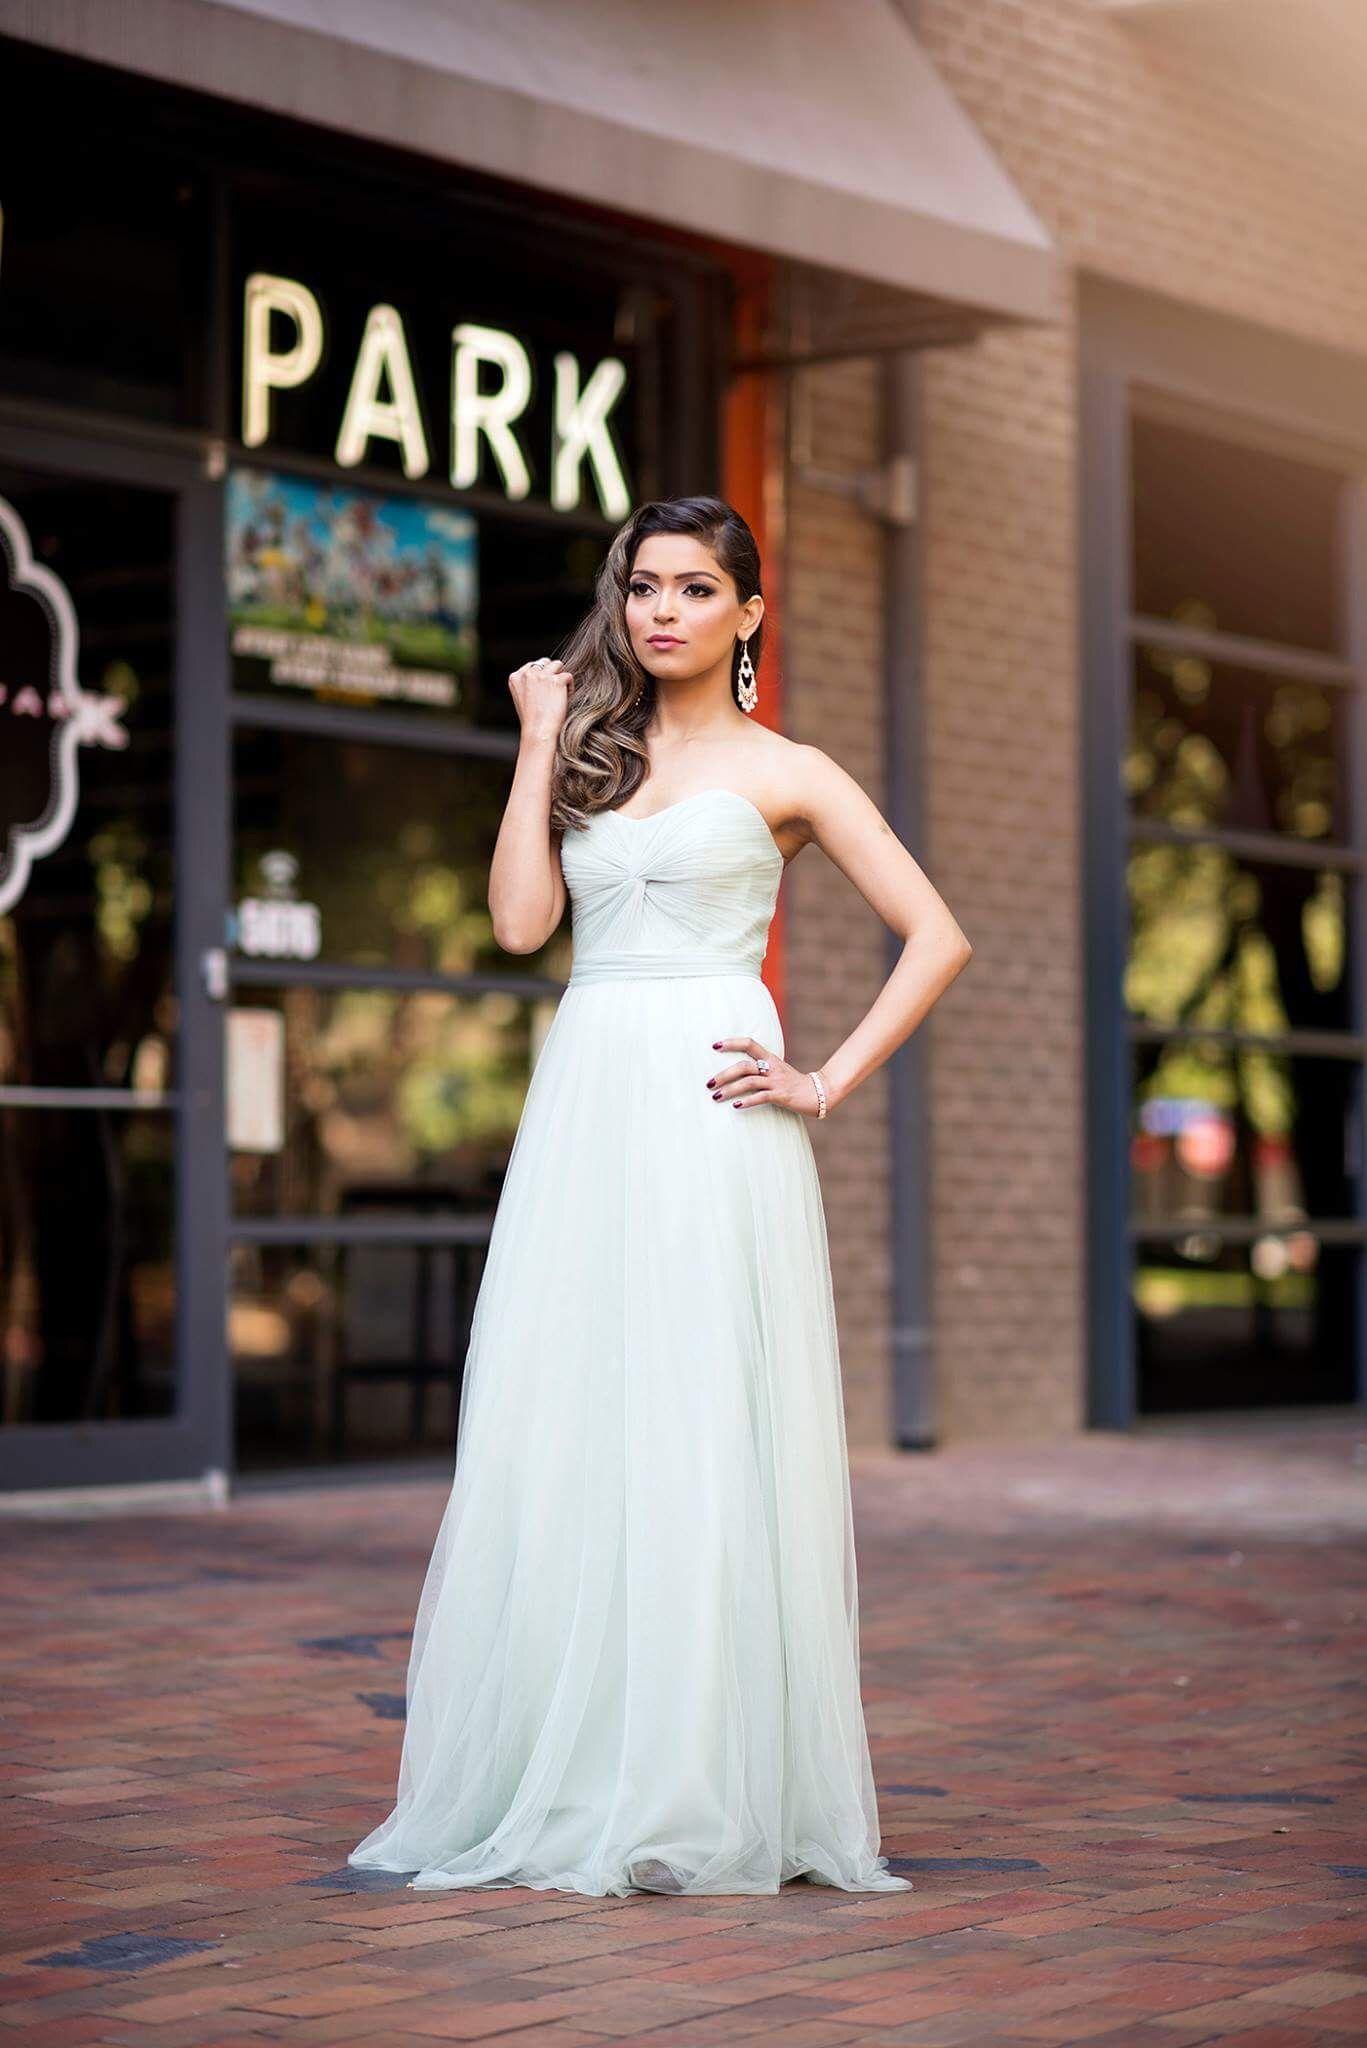 The tenley infinity dress by love tanya long flowy dresses in a